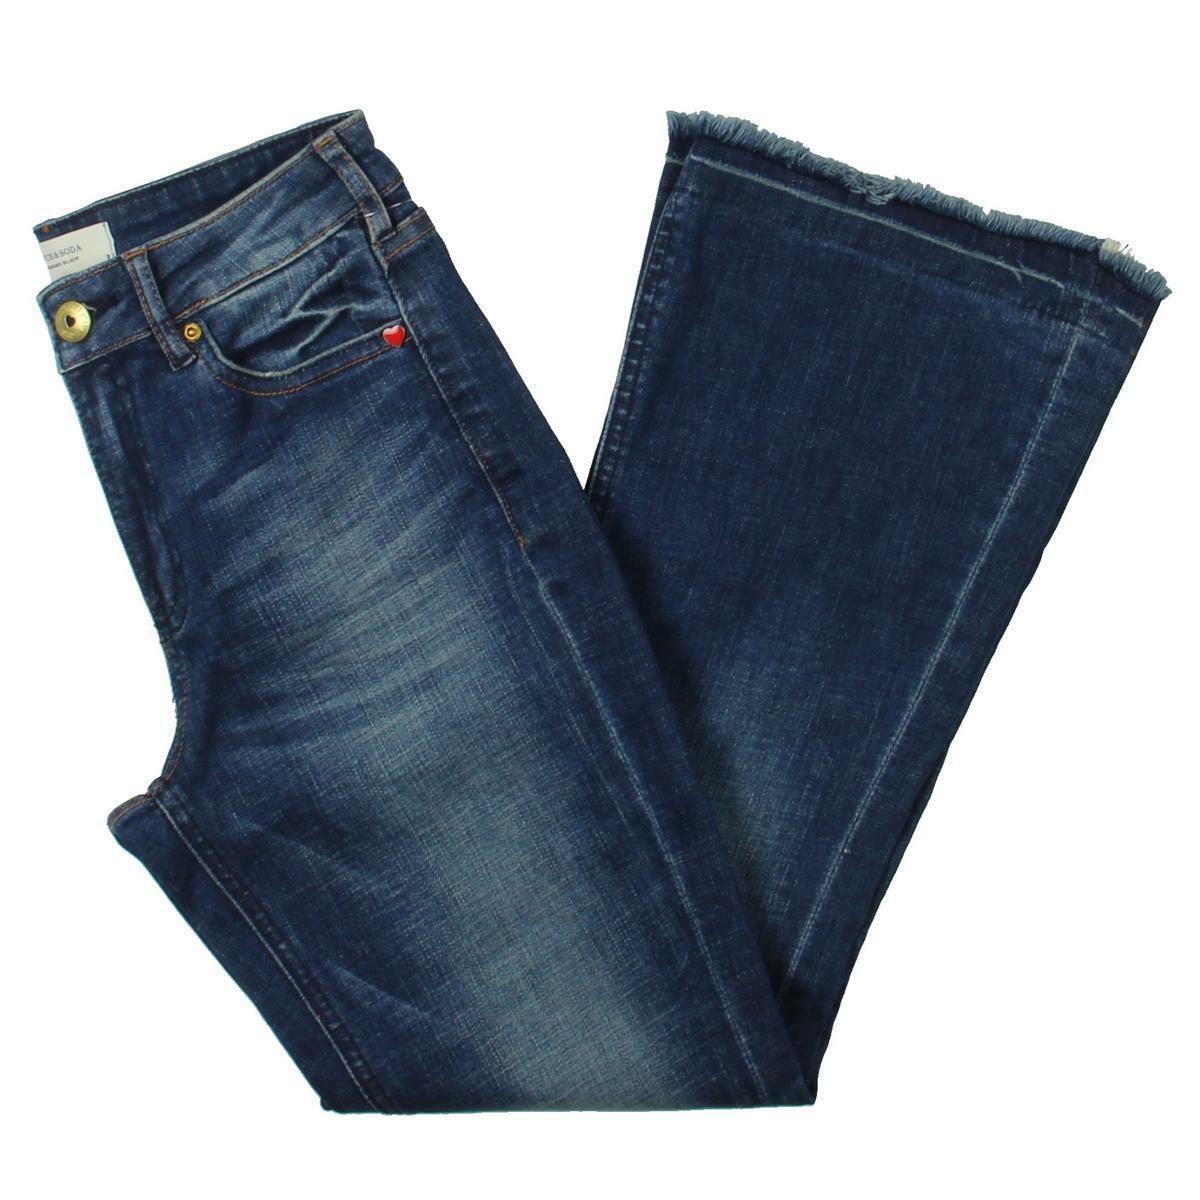 Scotch & Soda Womens bluee Mid-Rise Embellished Flare Jeans 31 32 BHFO 2820